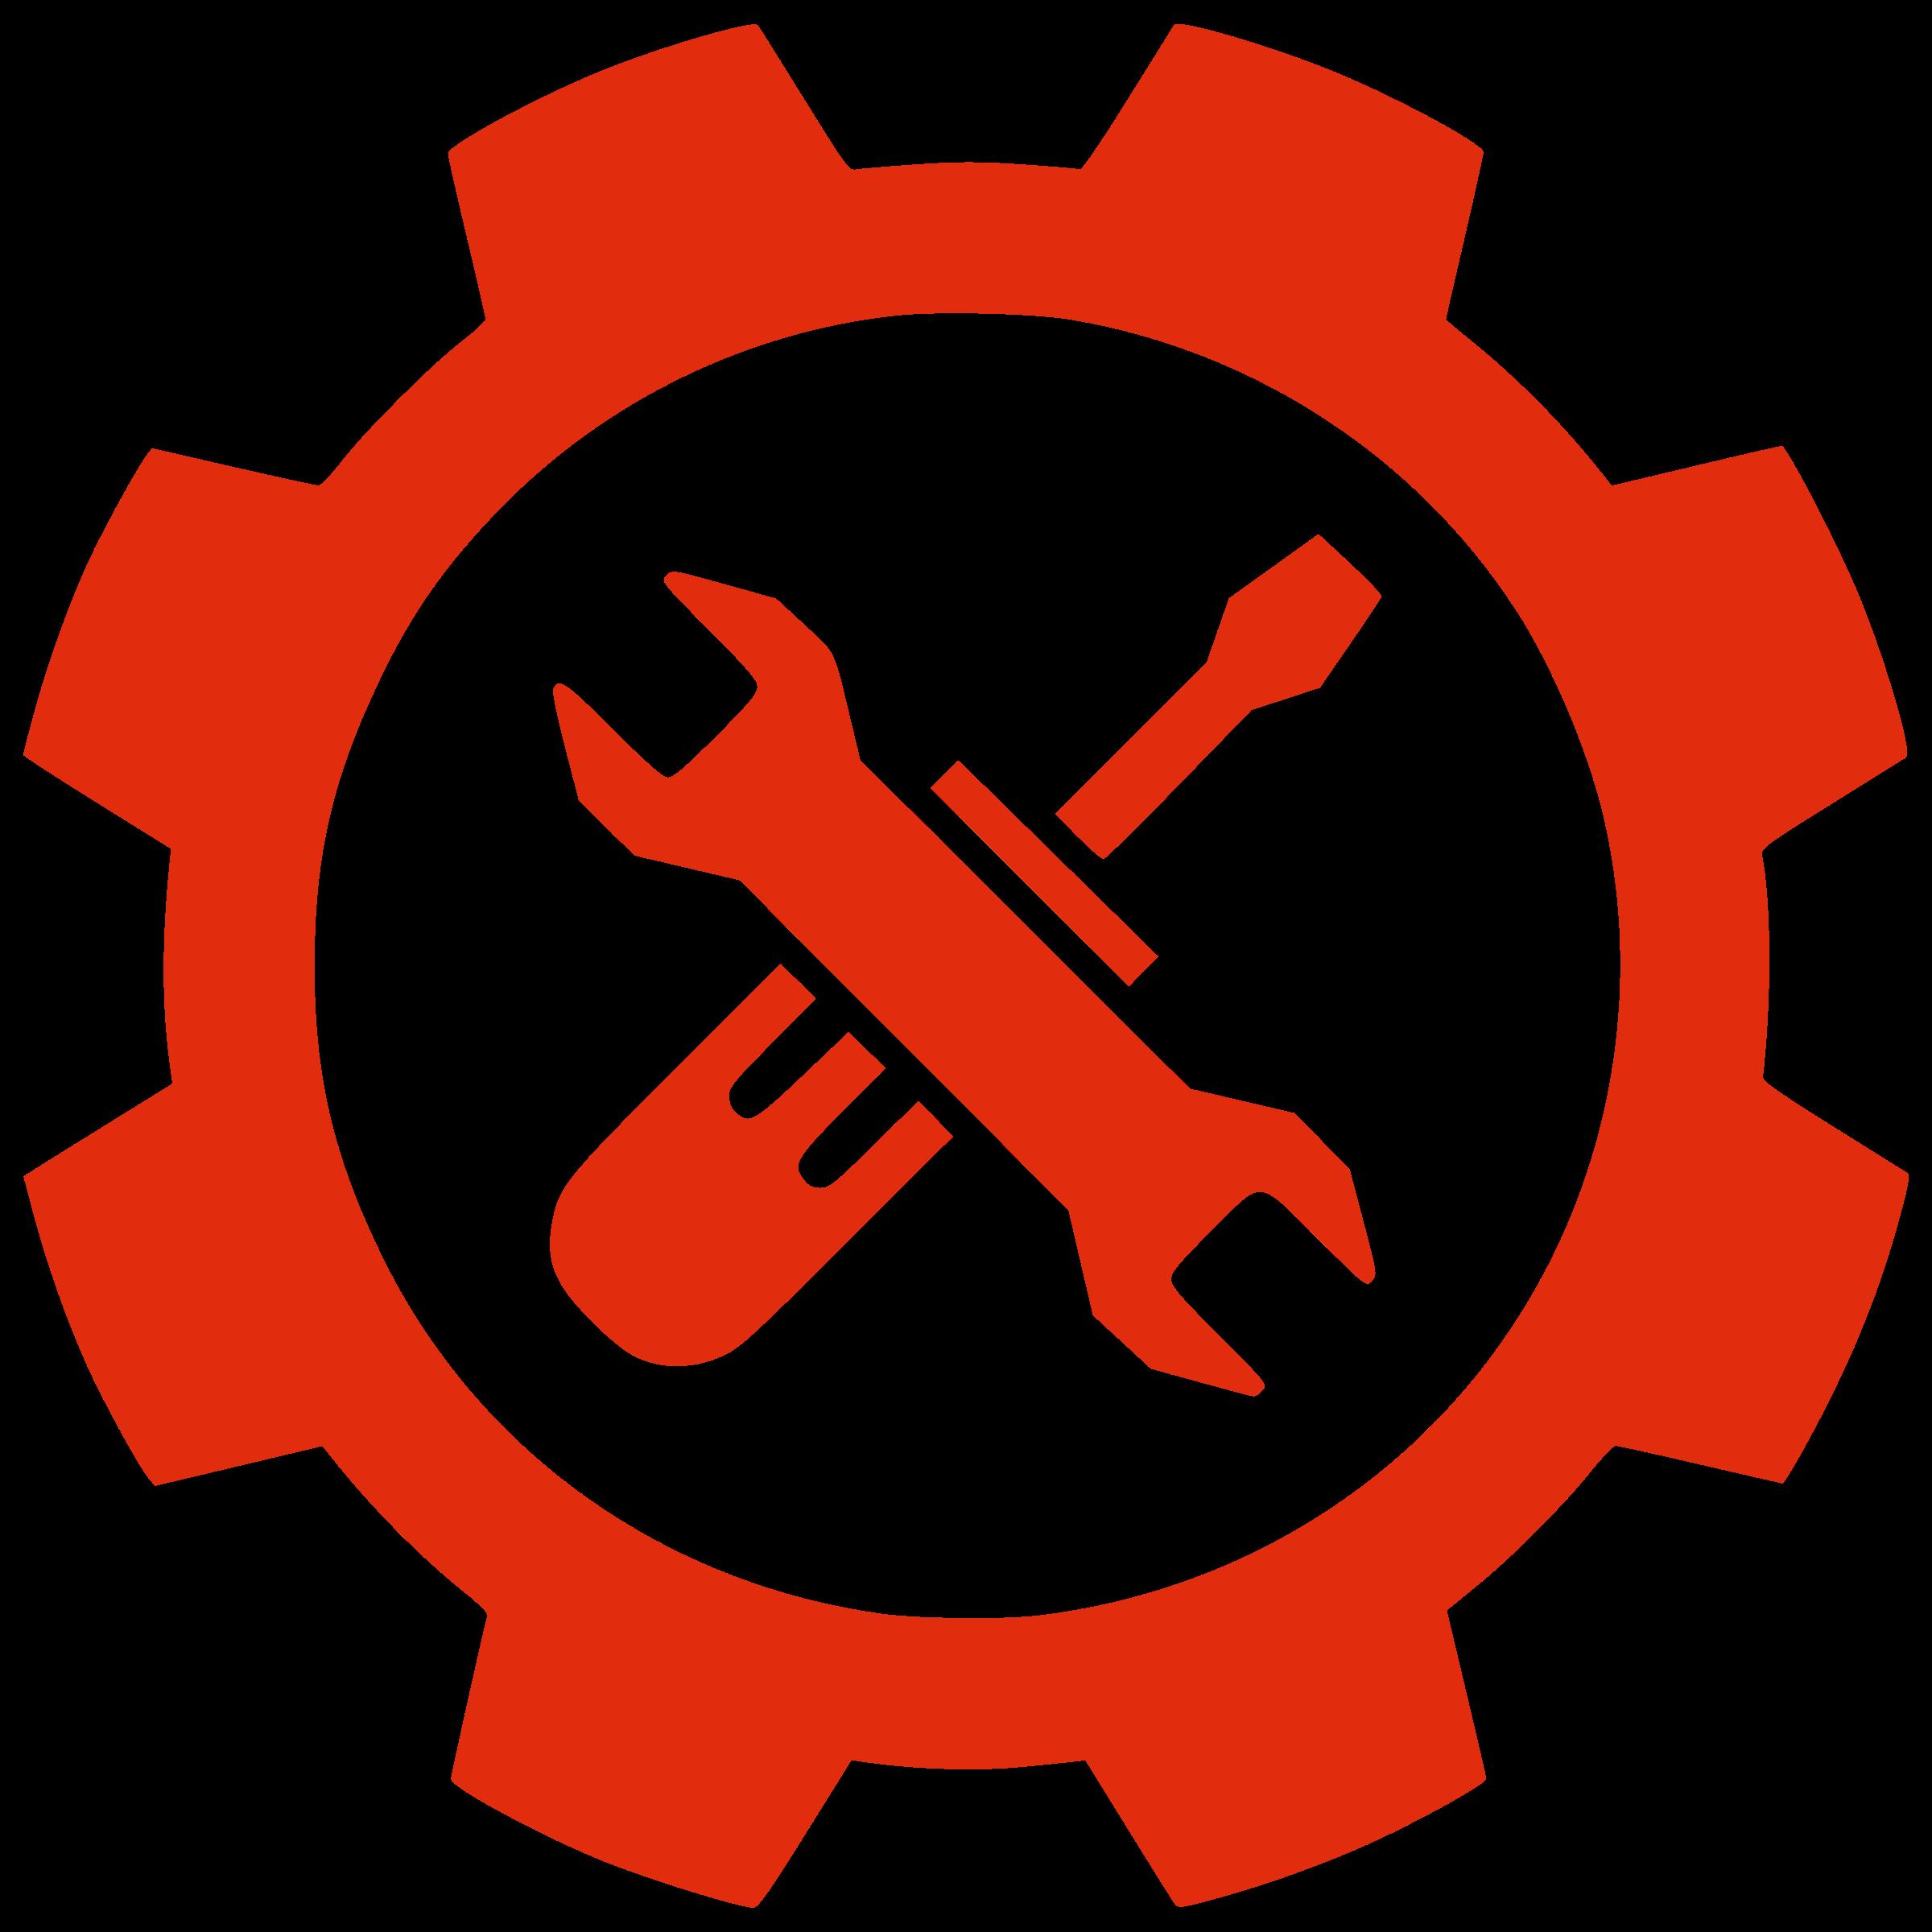 Handle Tools